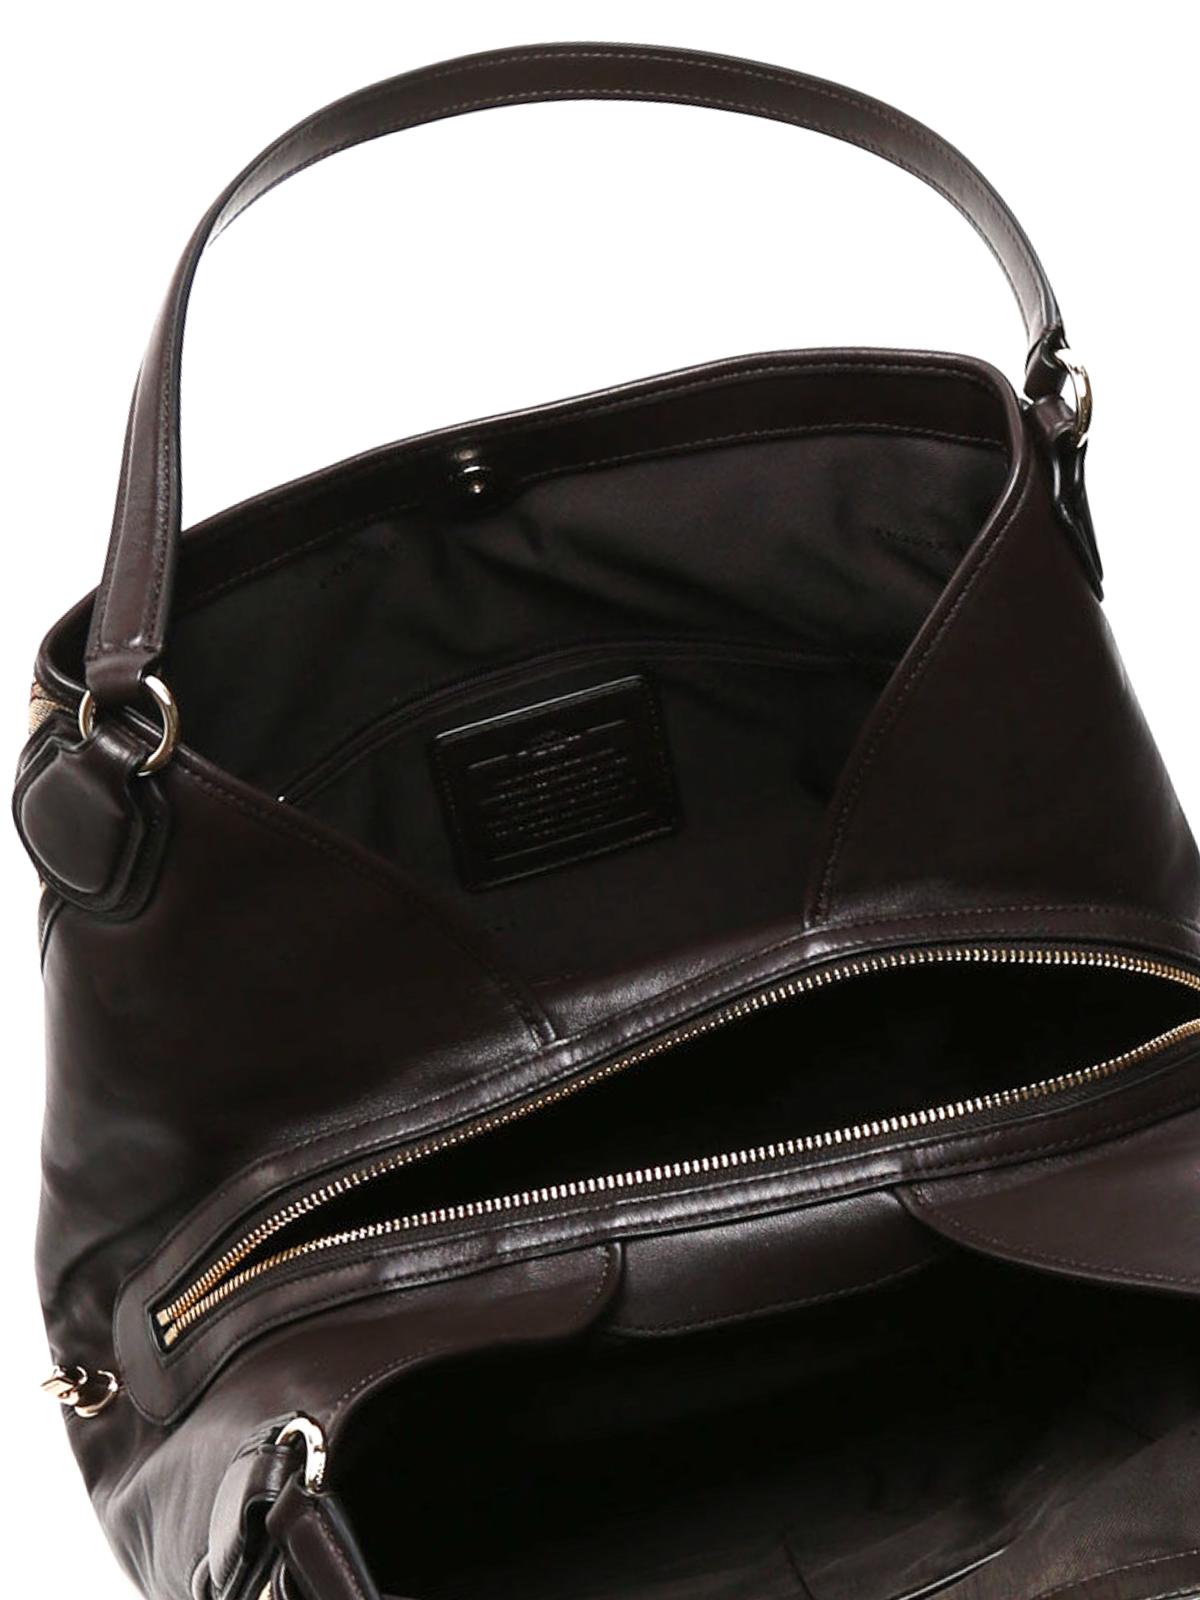 e6c2bc663001 Coach - Edie shoulder bag - shoulder bags - 33523 LIC7C